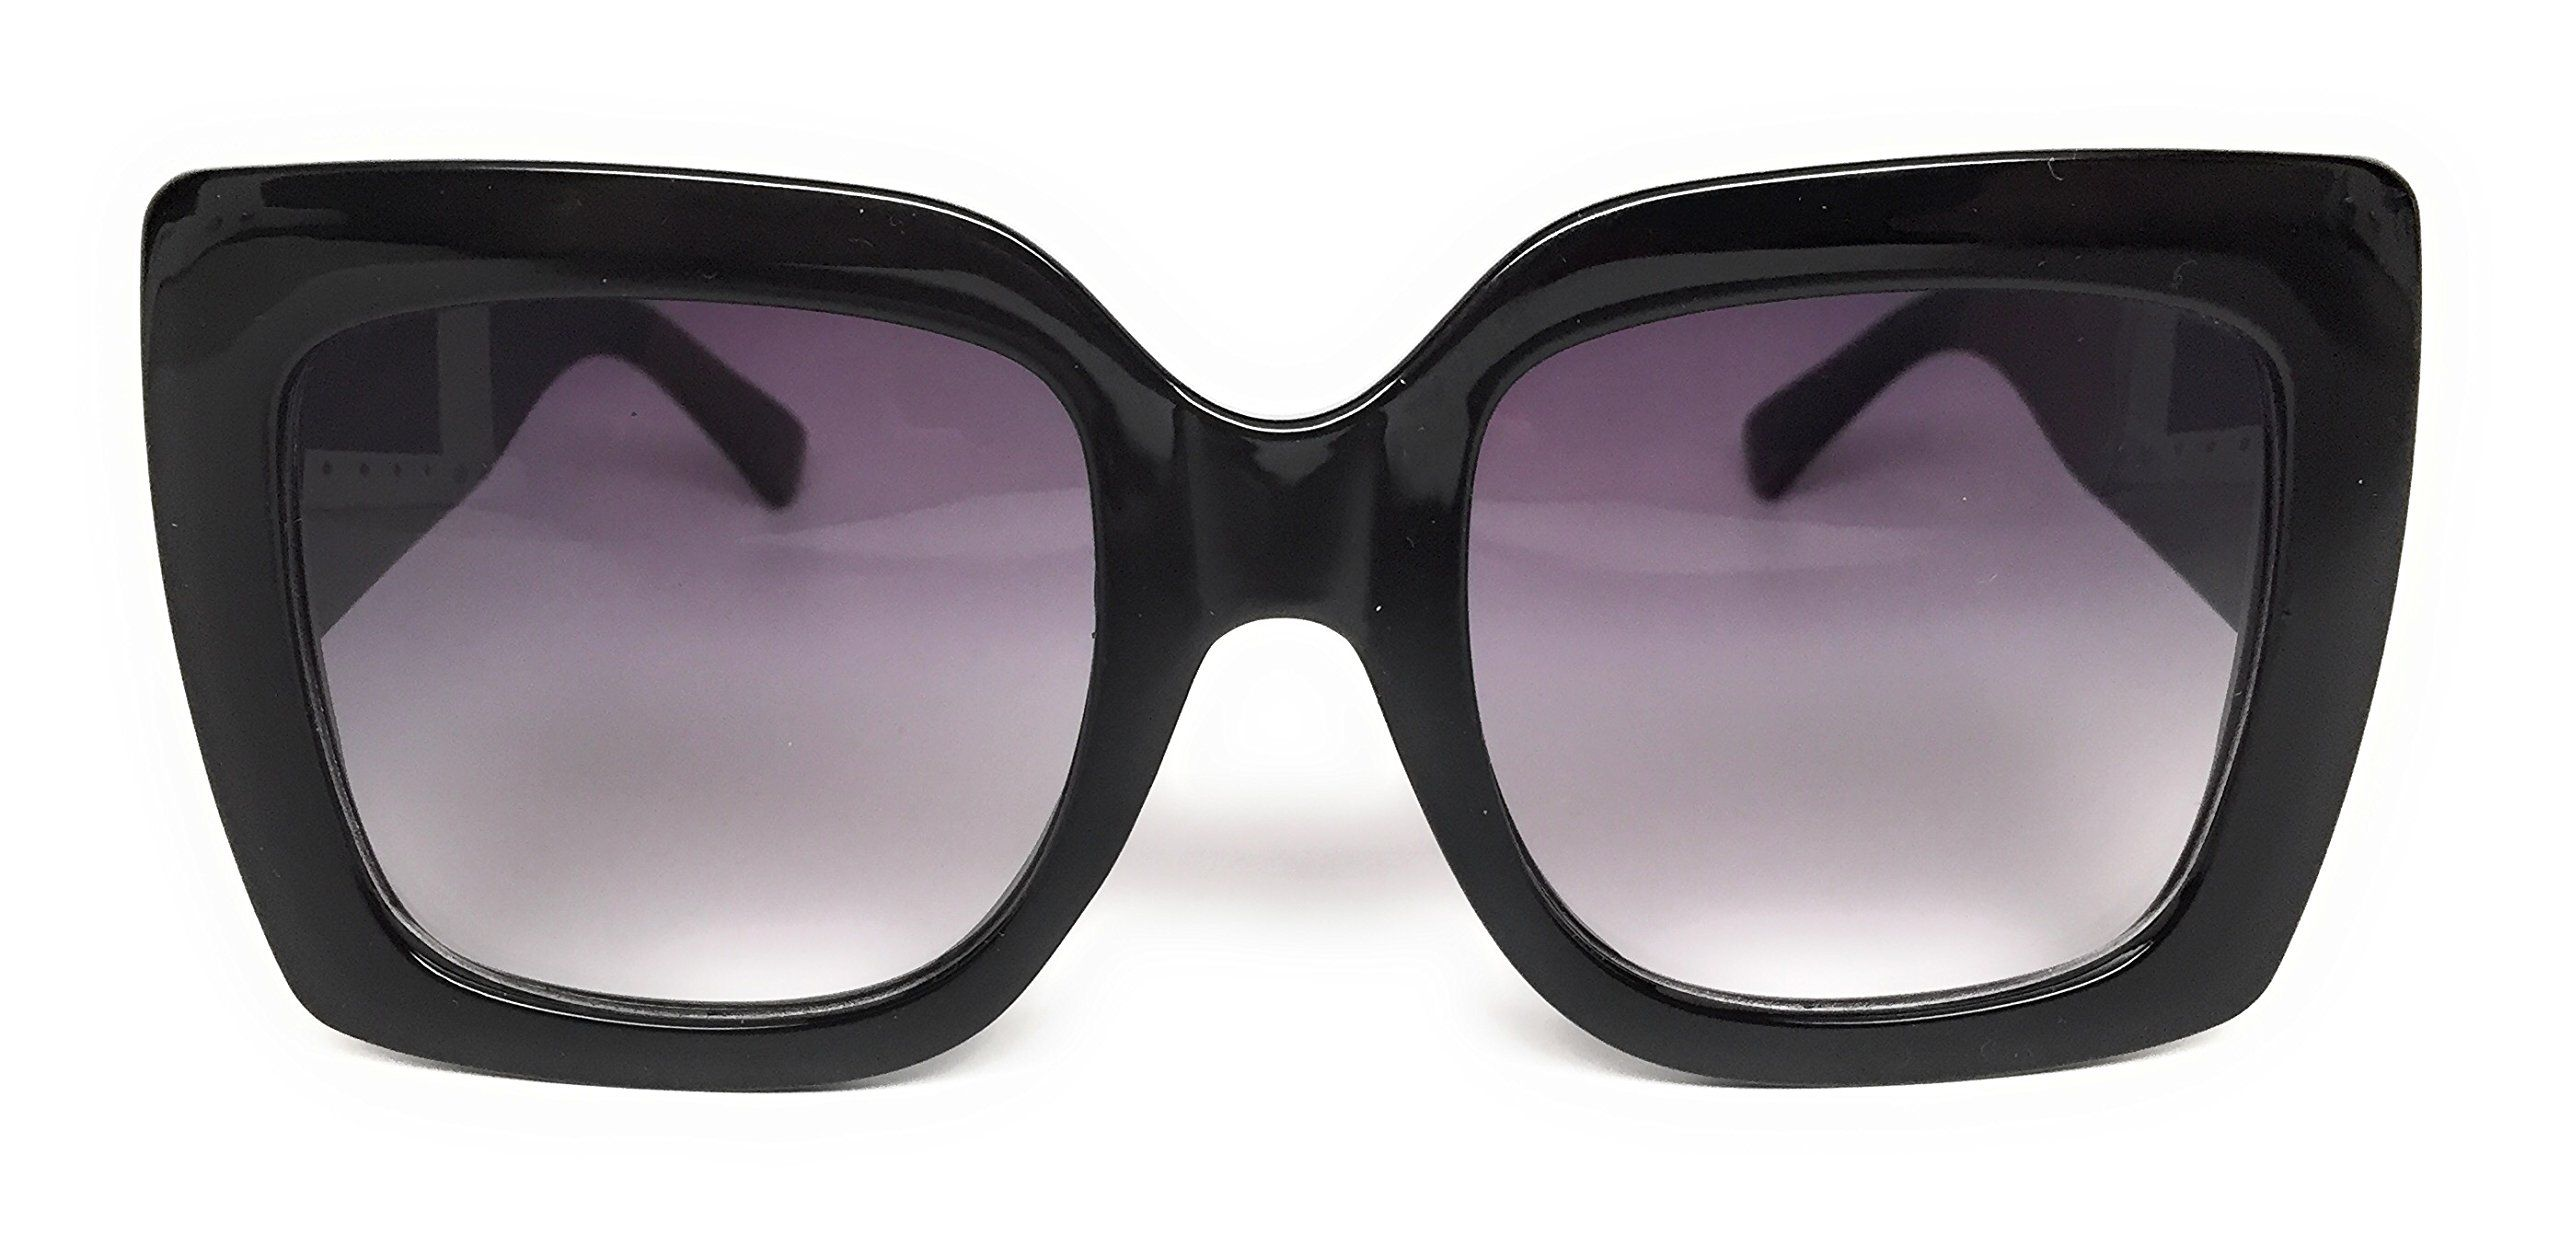 e39d4fe0fe My Shades(TM) - Designer Inspired Oversize Glitter Sparkle Square Frame  Sunglasses (Black Solid   Purple Gradient)  affiliate  glitter  gucci   sunglasses